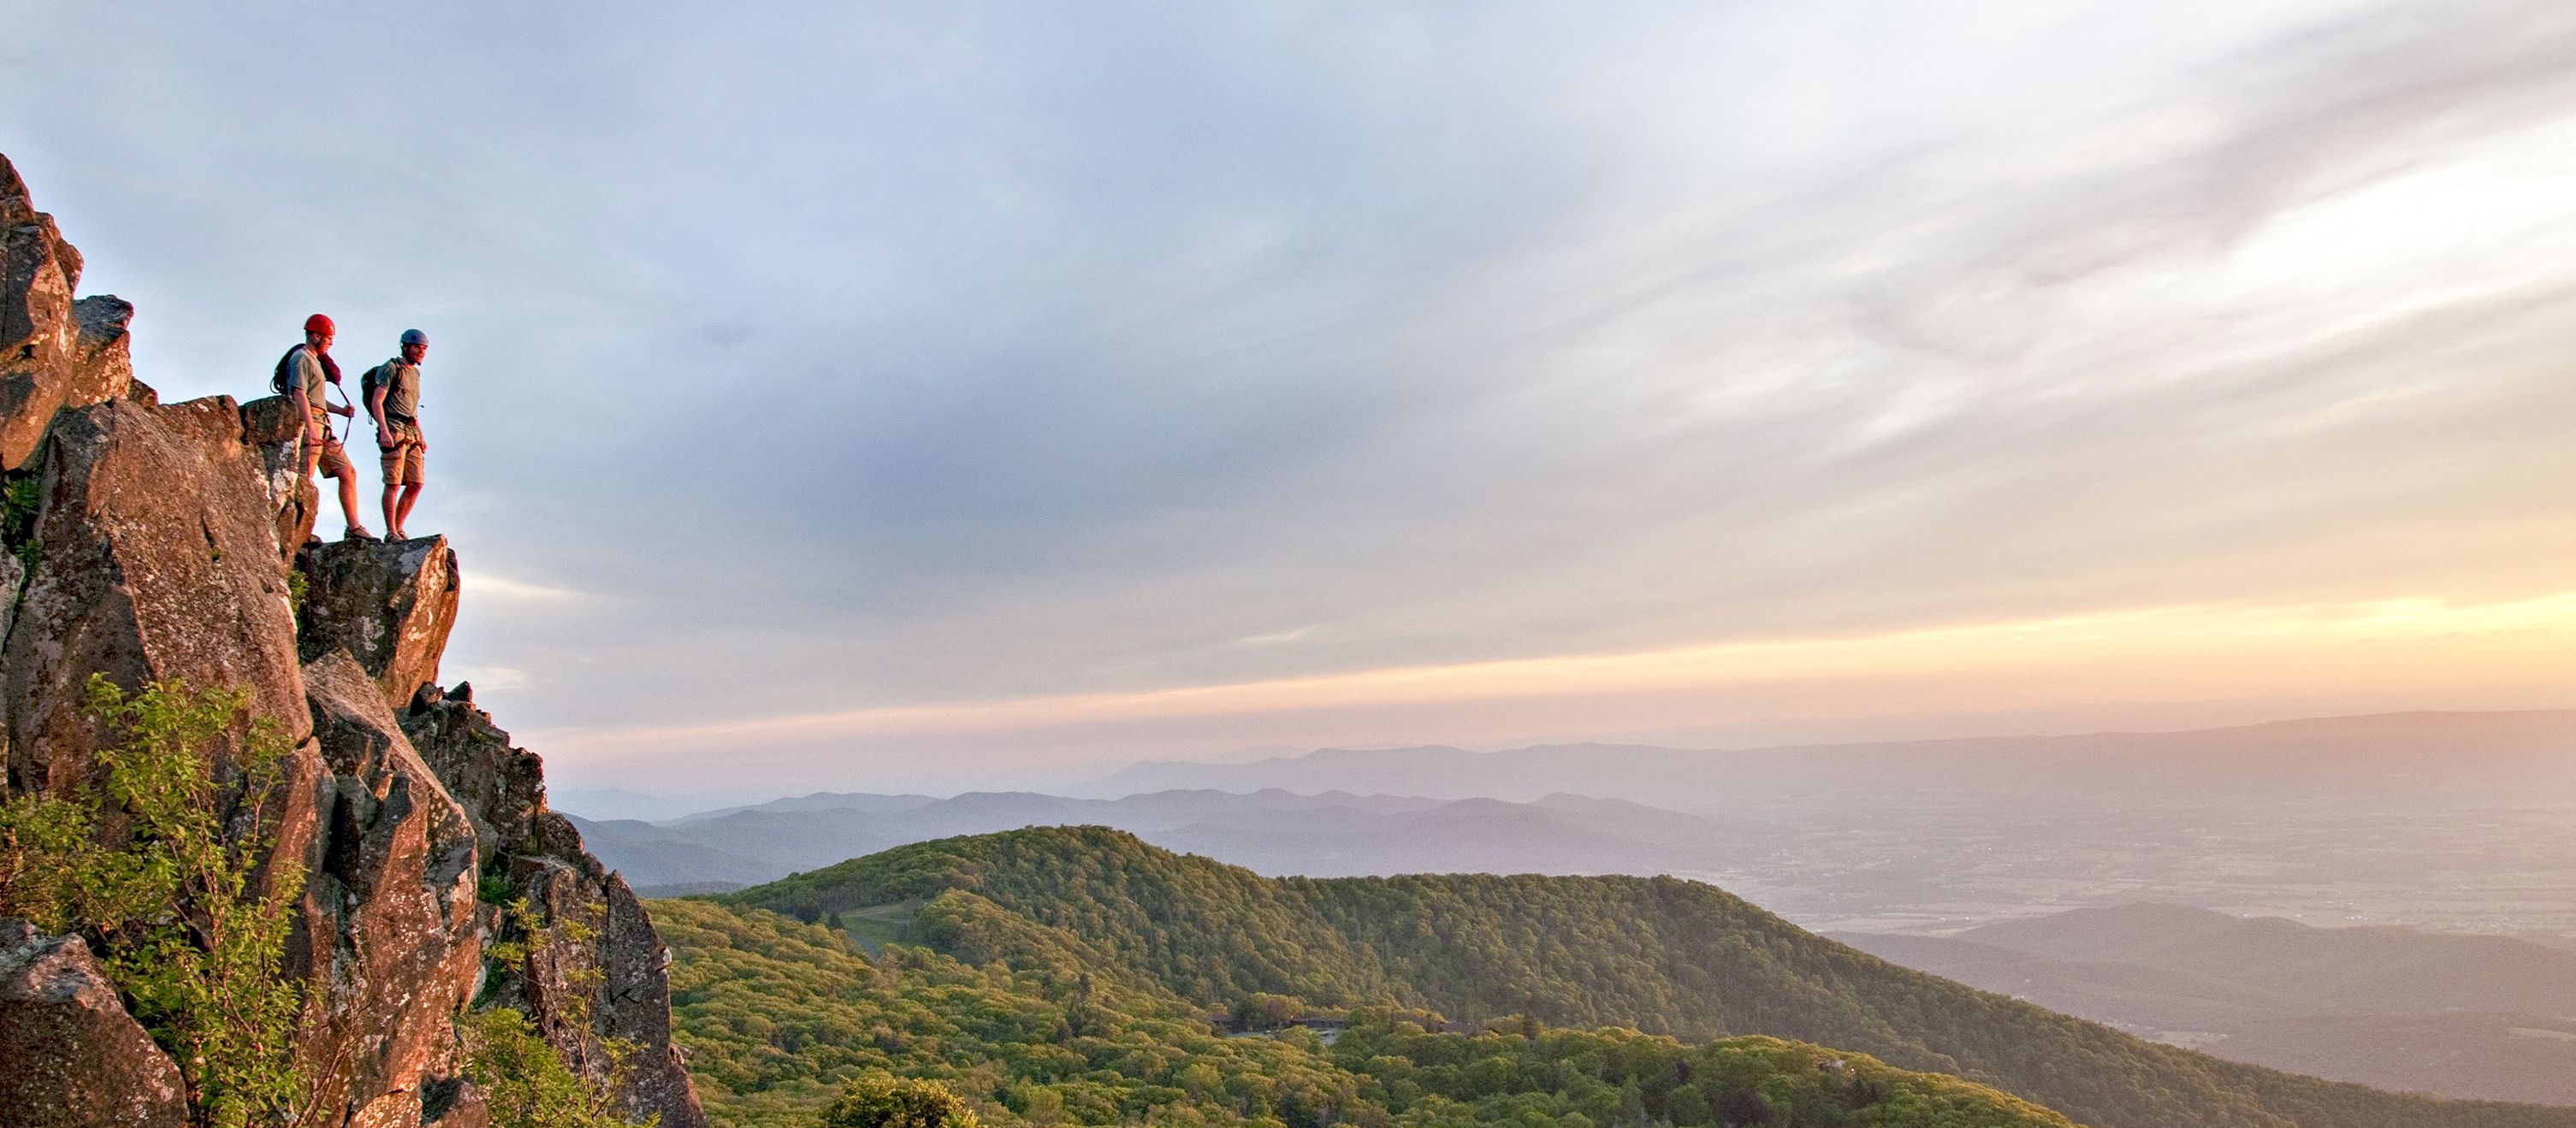 Den Ausblick des Shenandoah-Nationalpark genießen